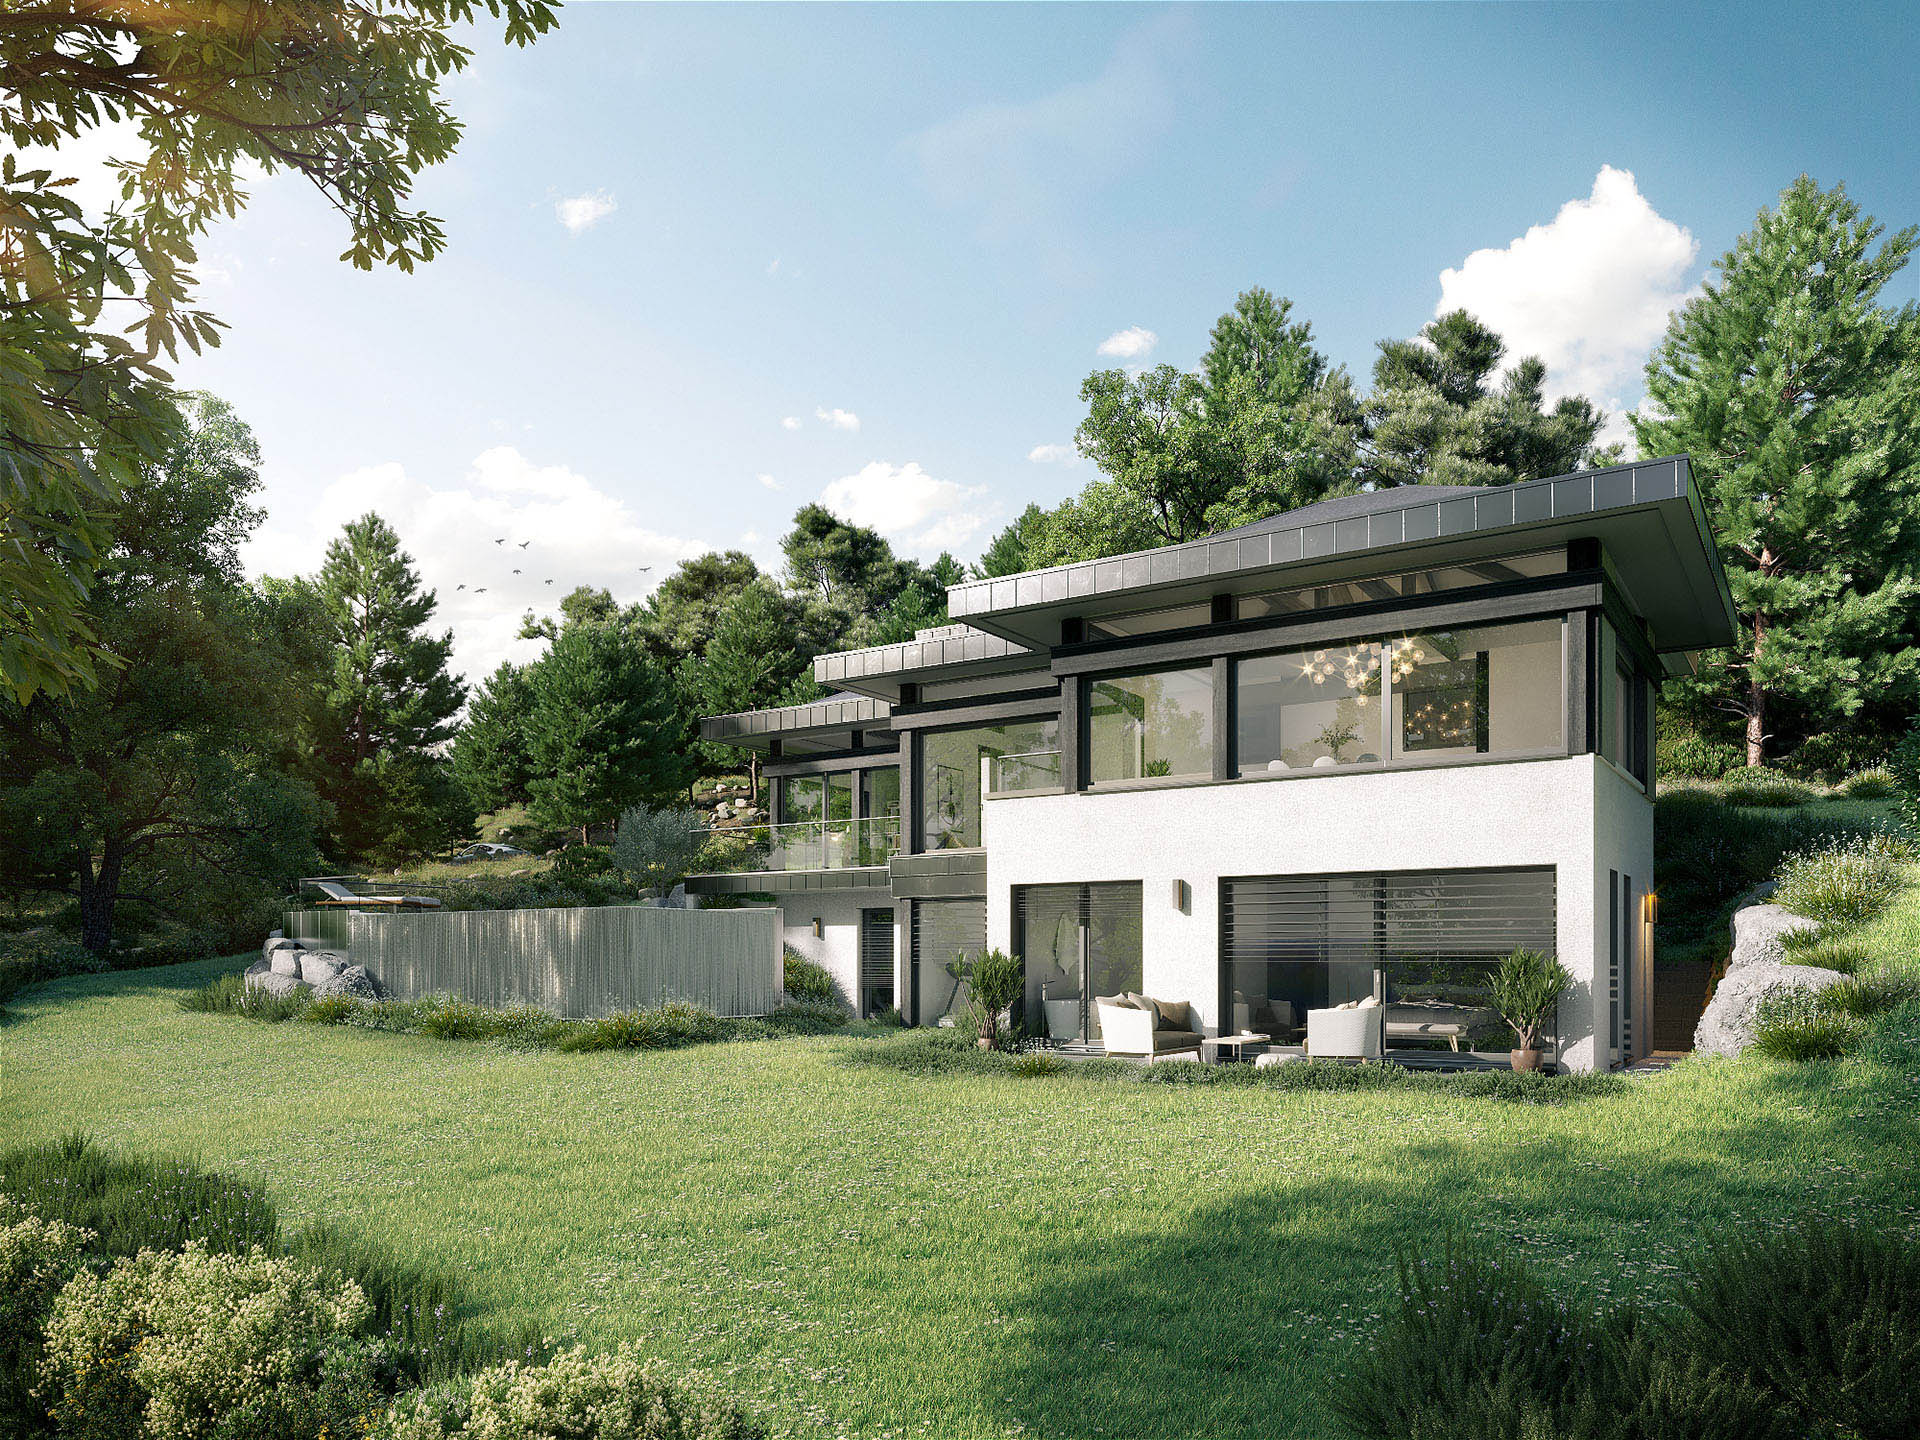 3D representation of a luxurious contemporary house